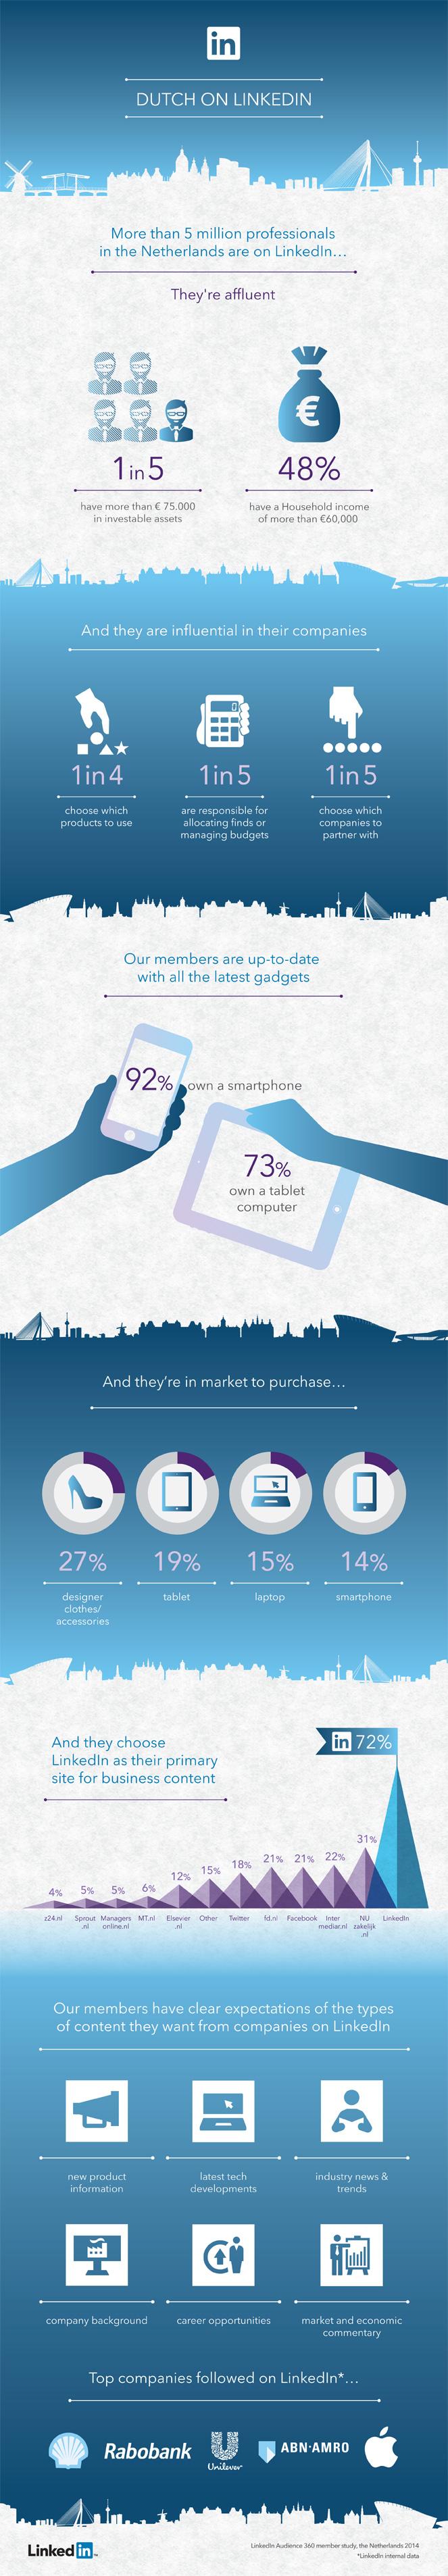 Infographic-linkedin-nederland